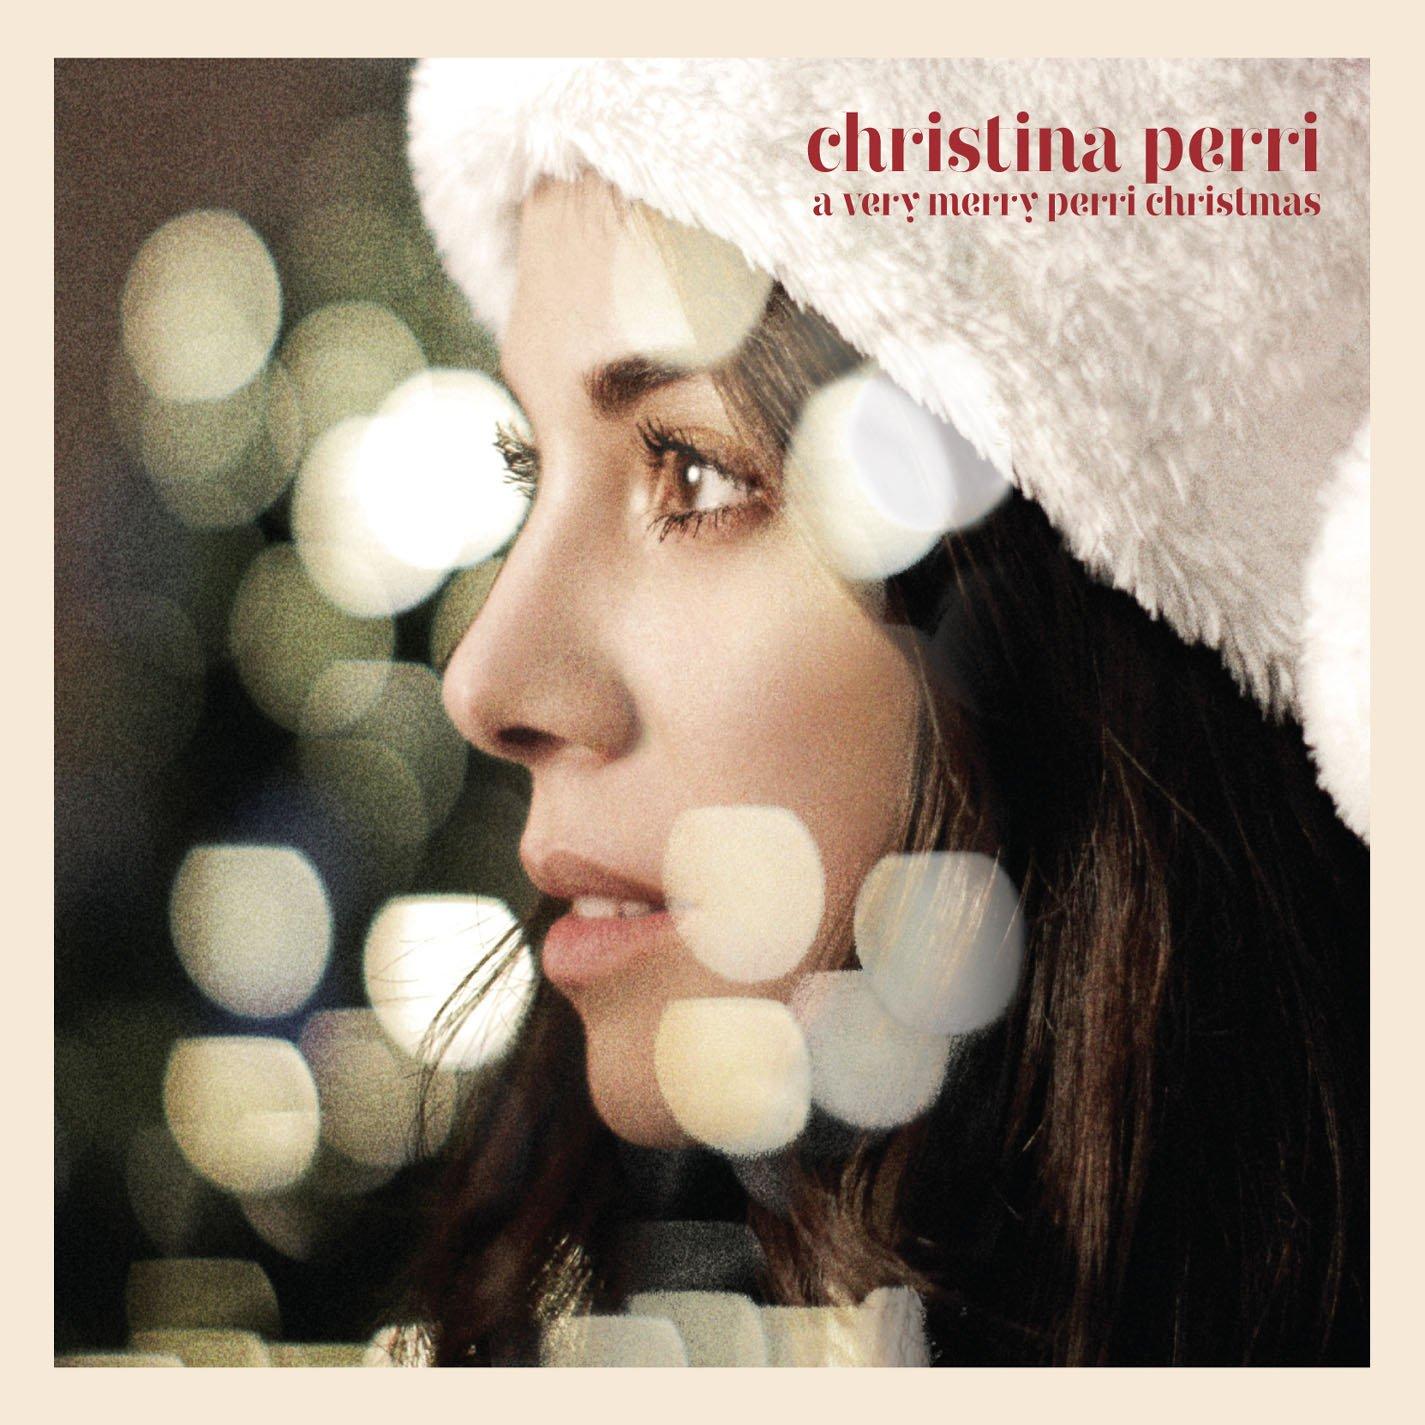 Christina Perri - a very merry perri christmas - Amazon.com Music